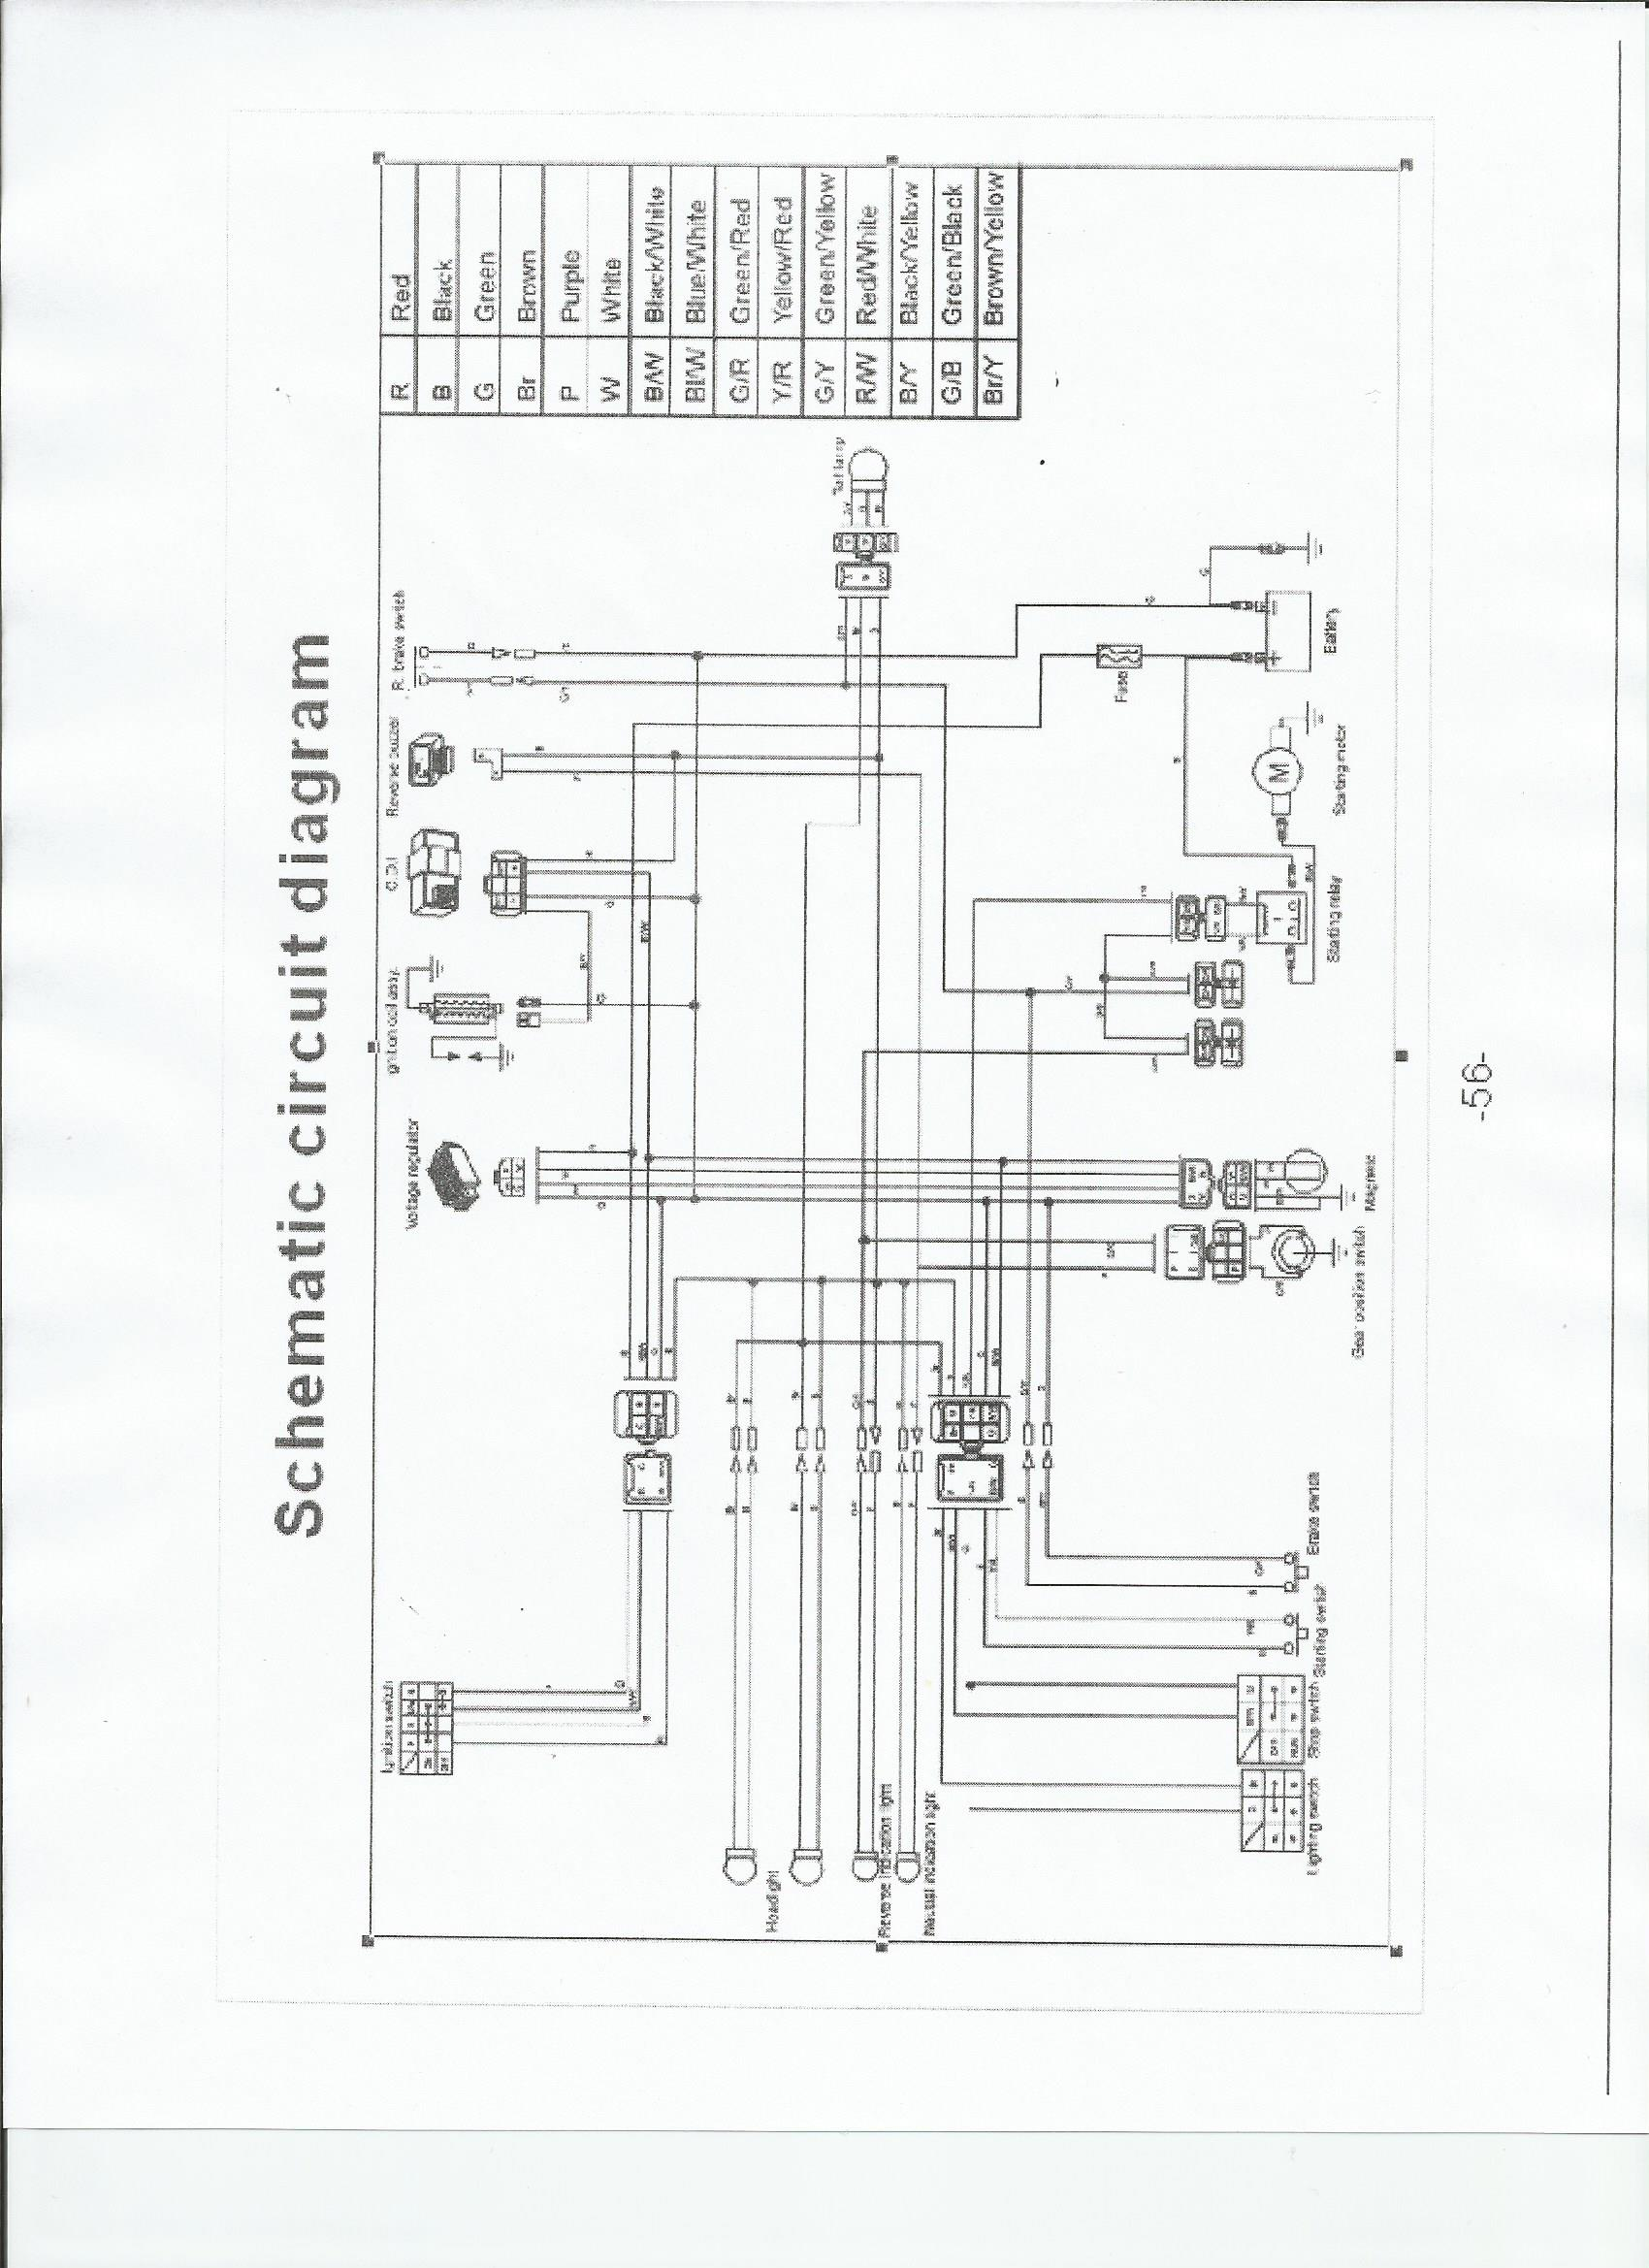 medium resolution of taotao mini and youth atv wiring schematic familygokarts support 110cc pocket bike wiring diagram tao 110cc wiring diagram